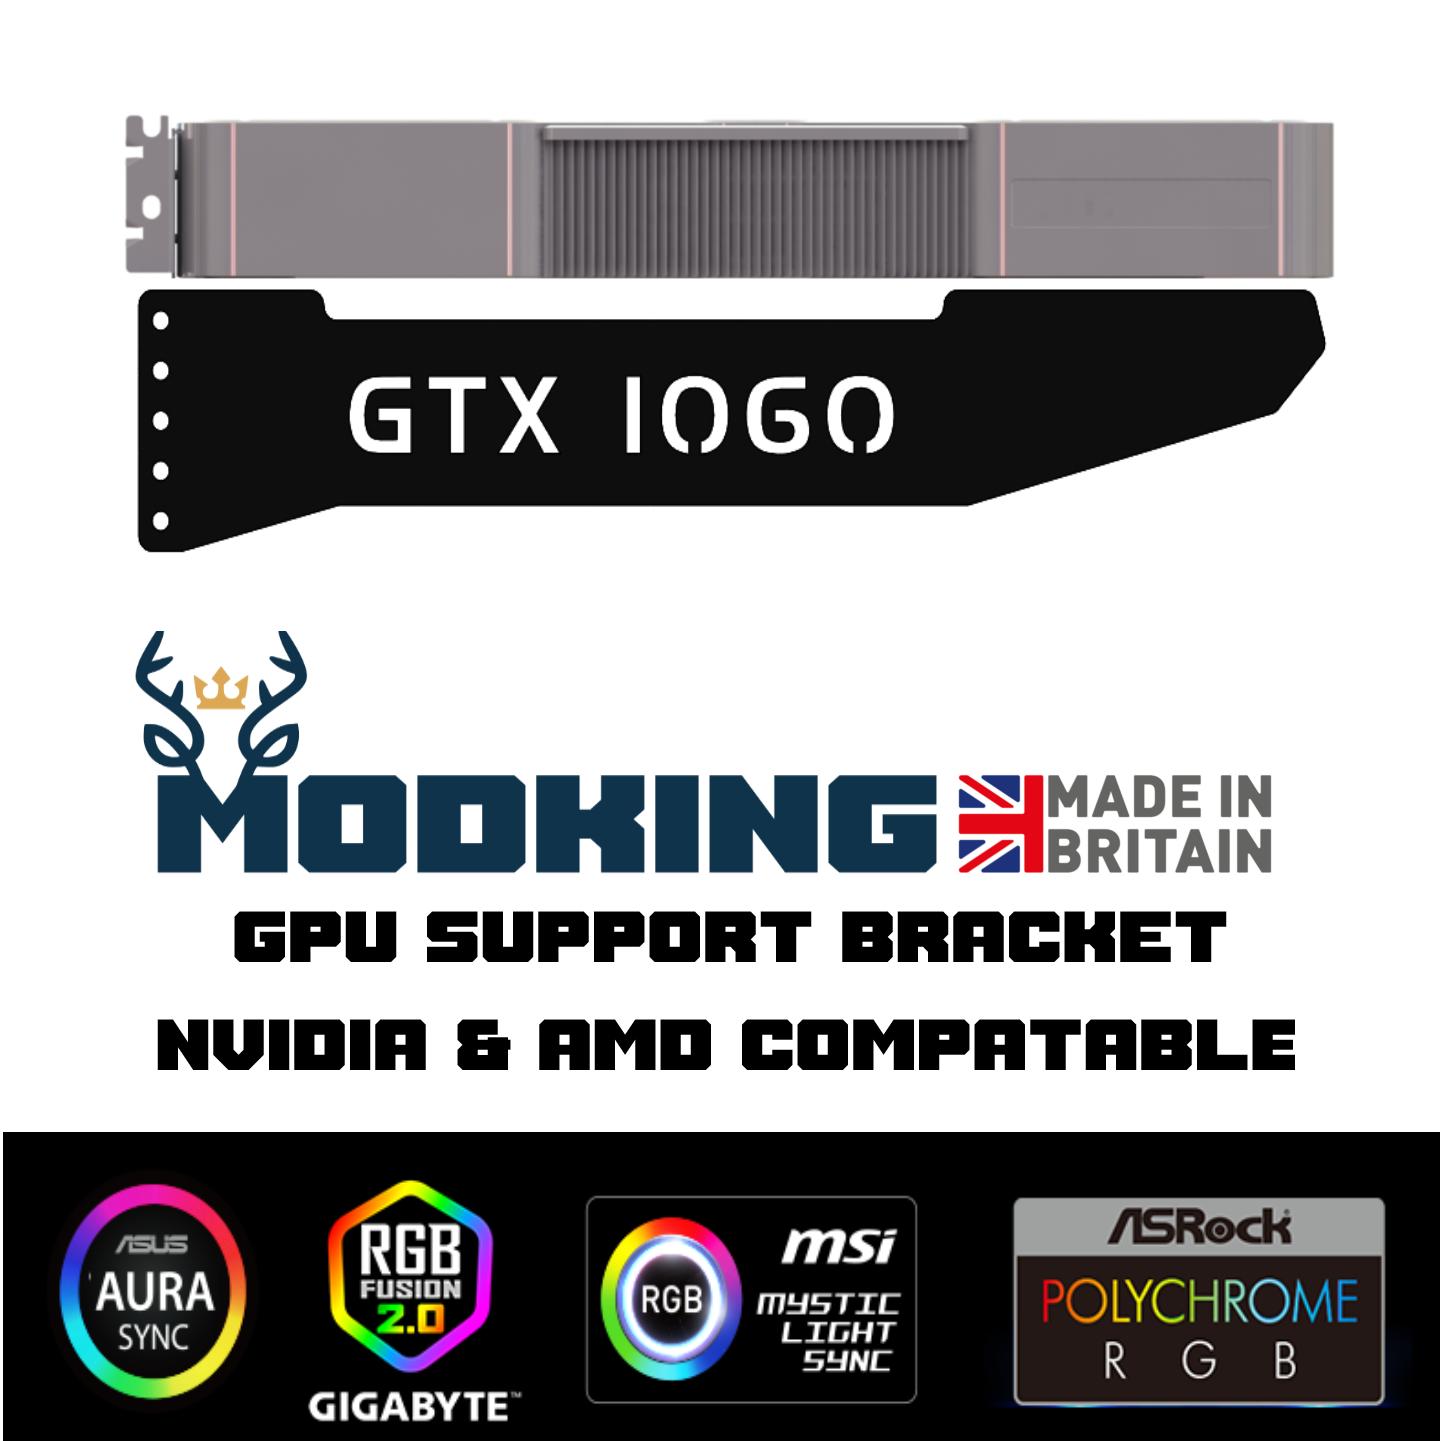 GTX 1060 - LED RGB GPU Anti-Sagging Support Bracket Brace NVIDIA AMD GTX RTX